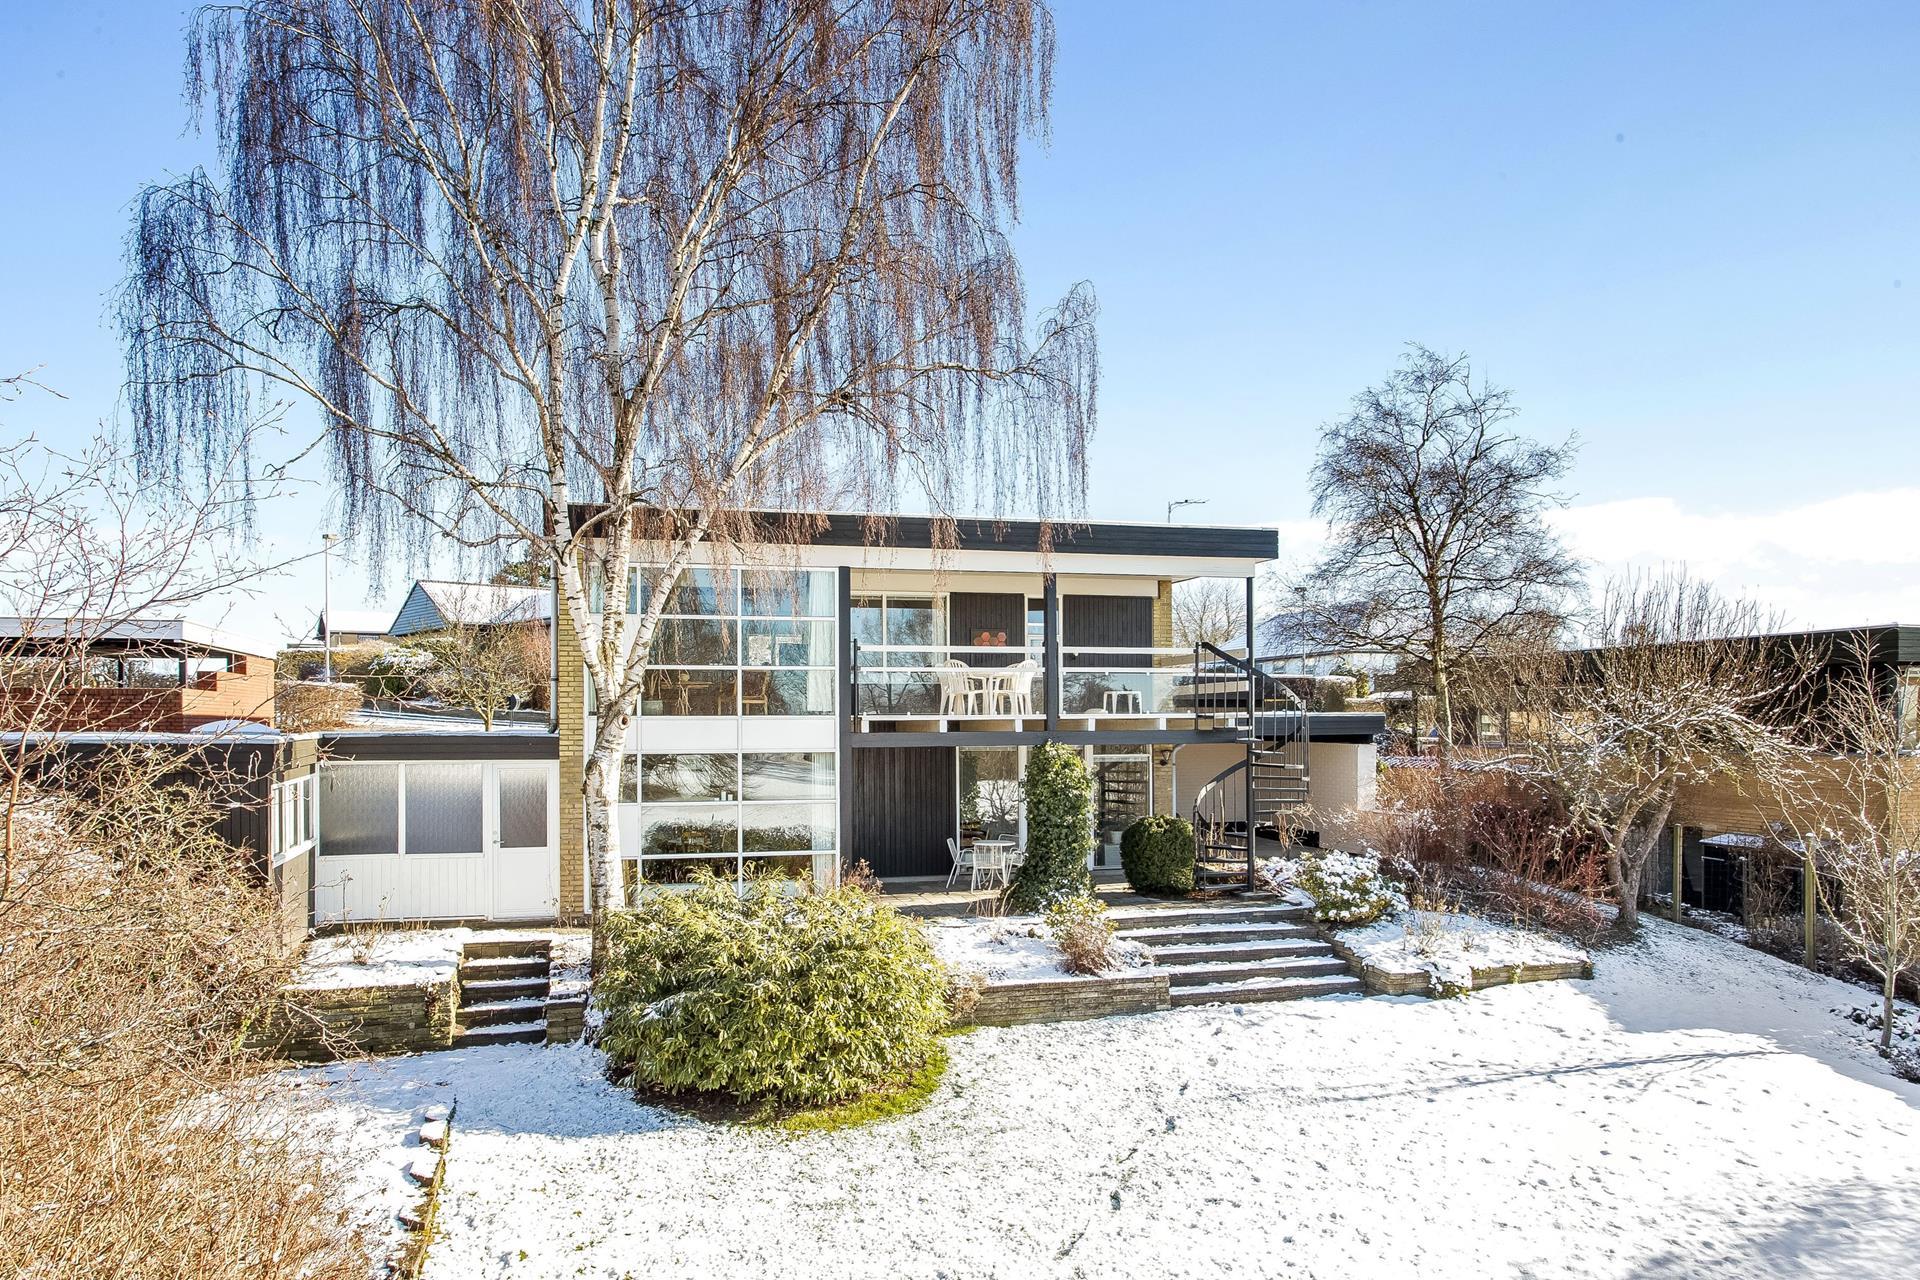 Villa på Birkebakken i Lystrup - Ejendommen